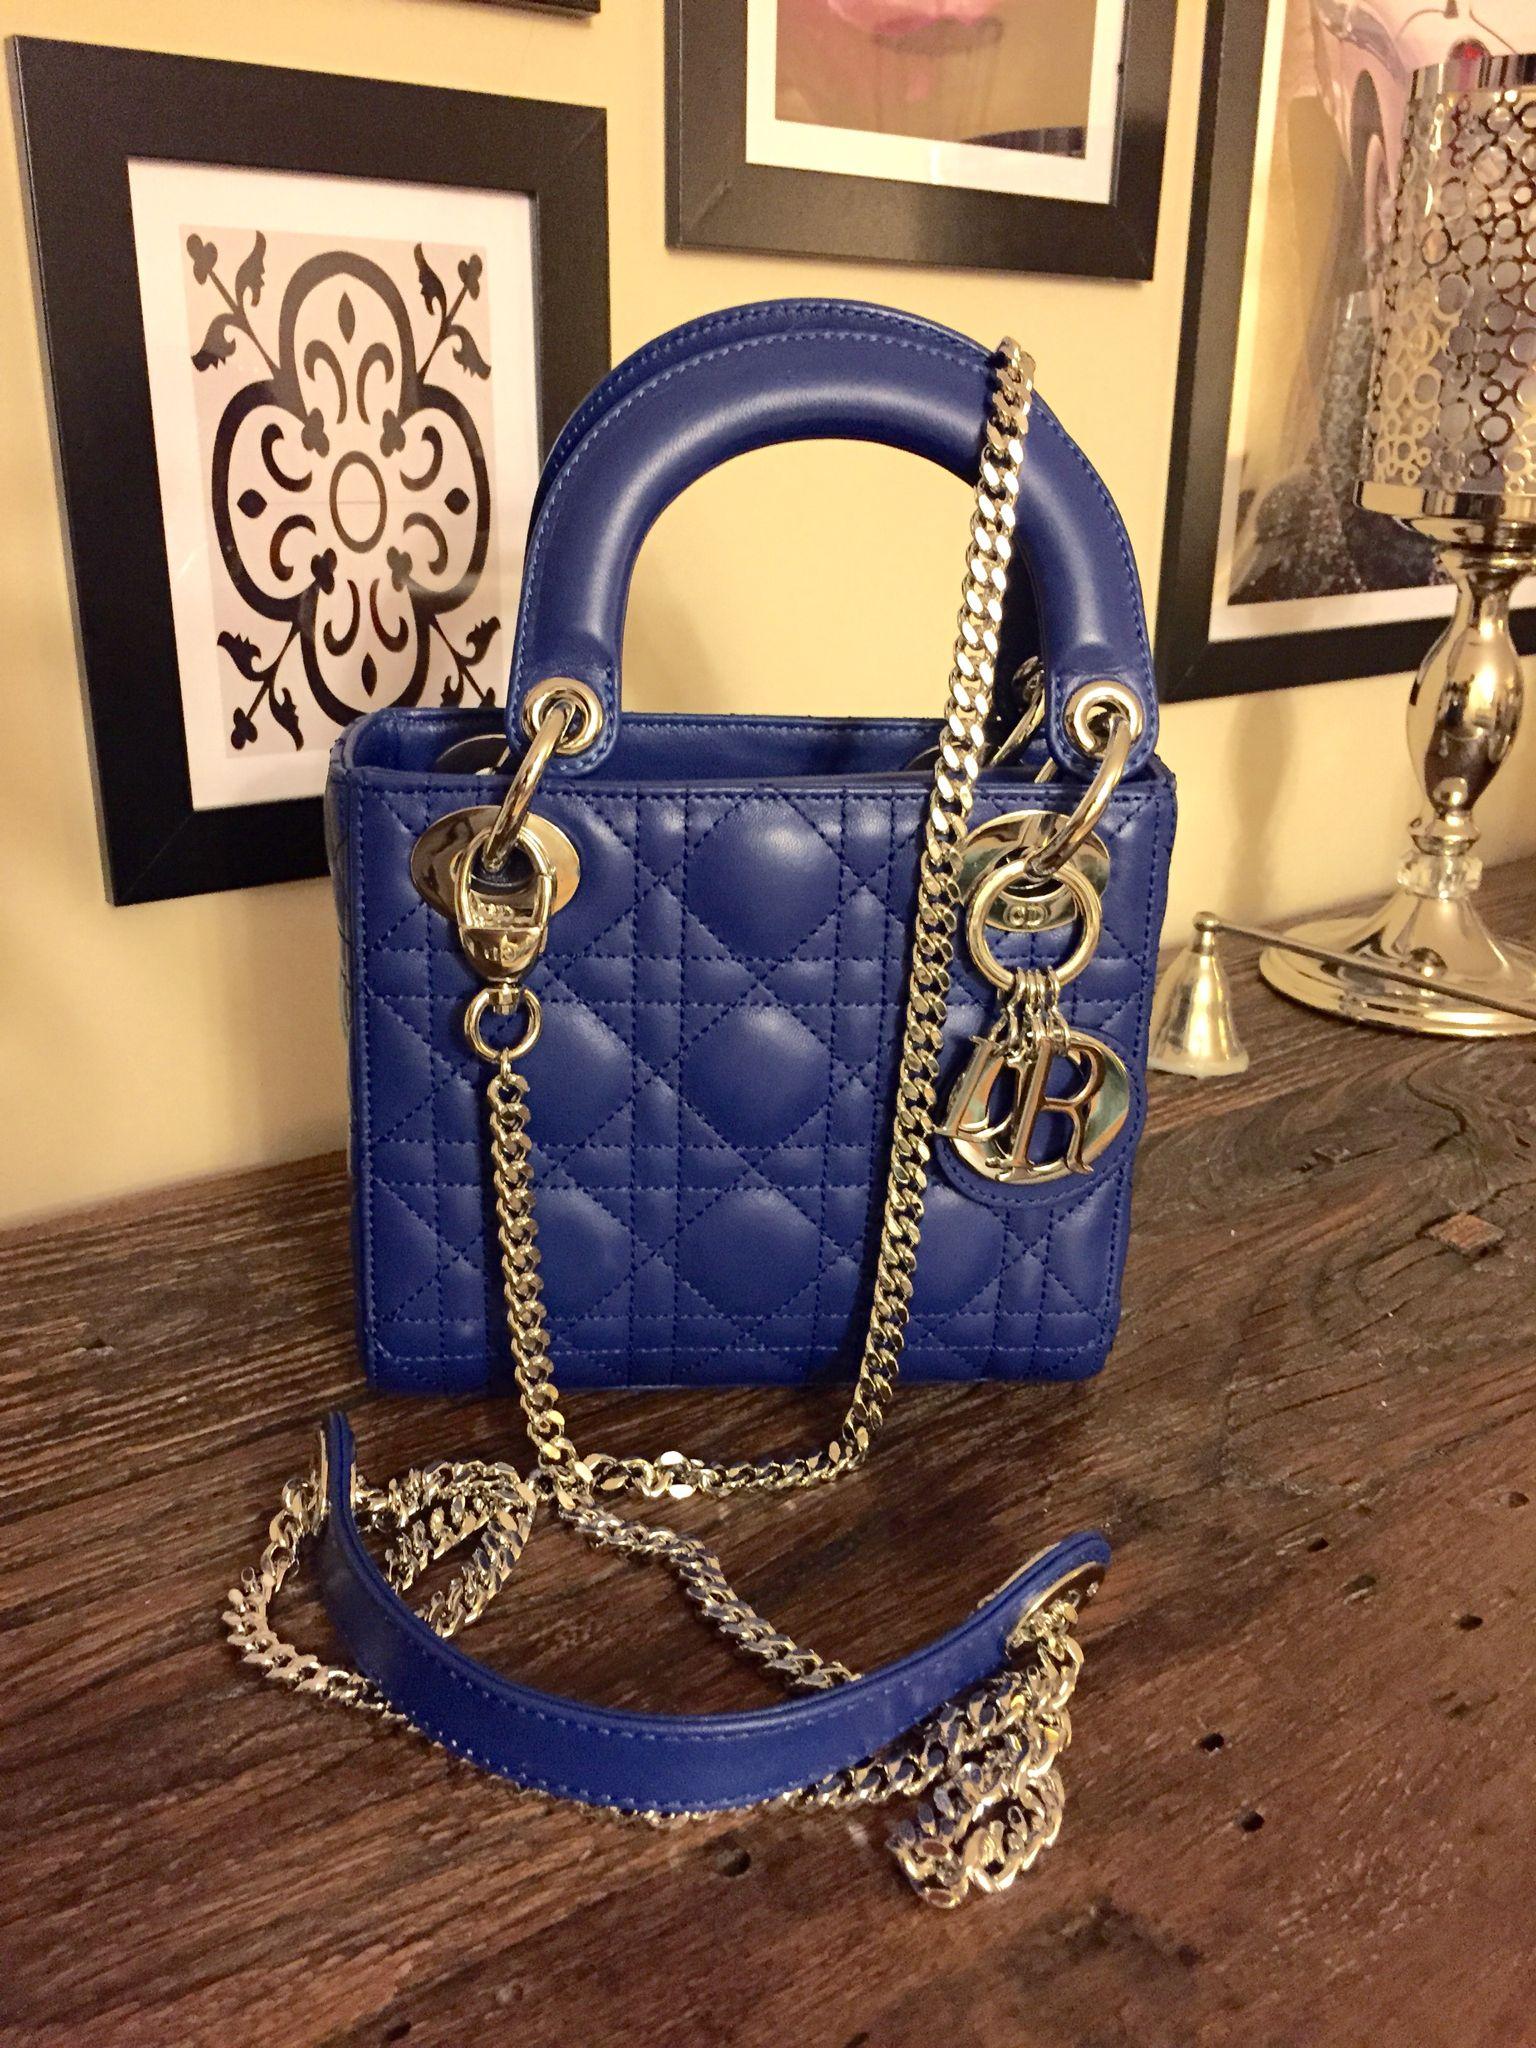 c65ed9c5a29 Mini Lady Dior bag